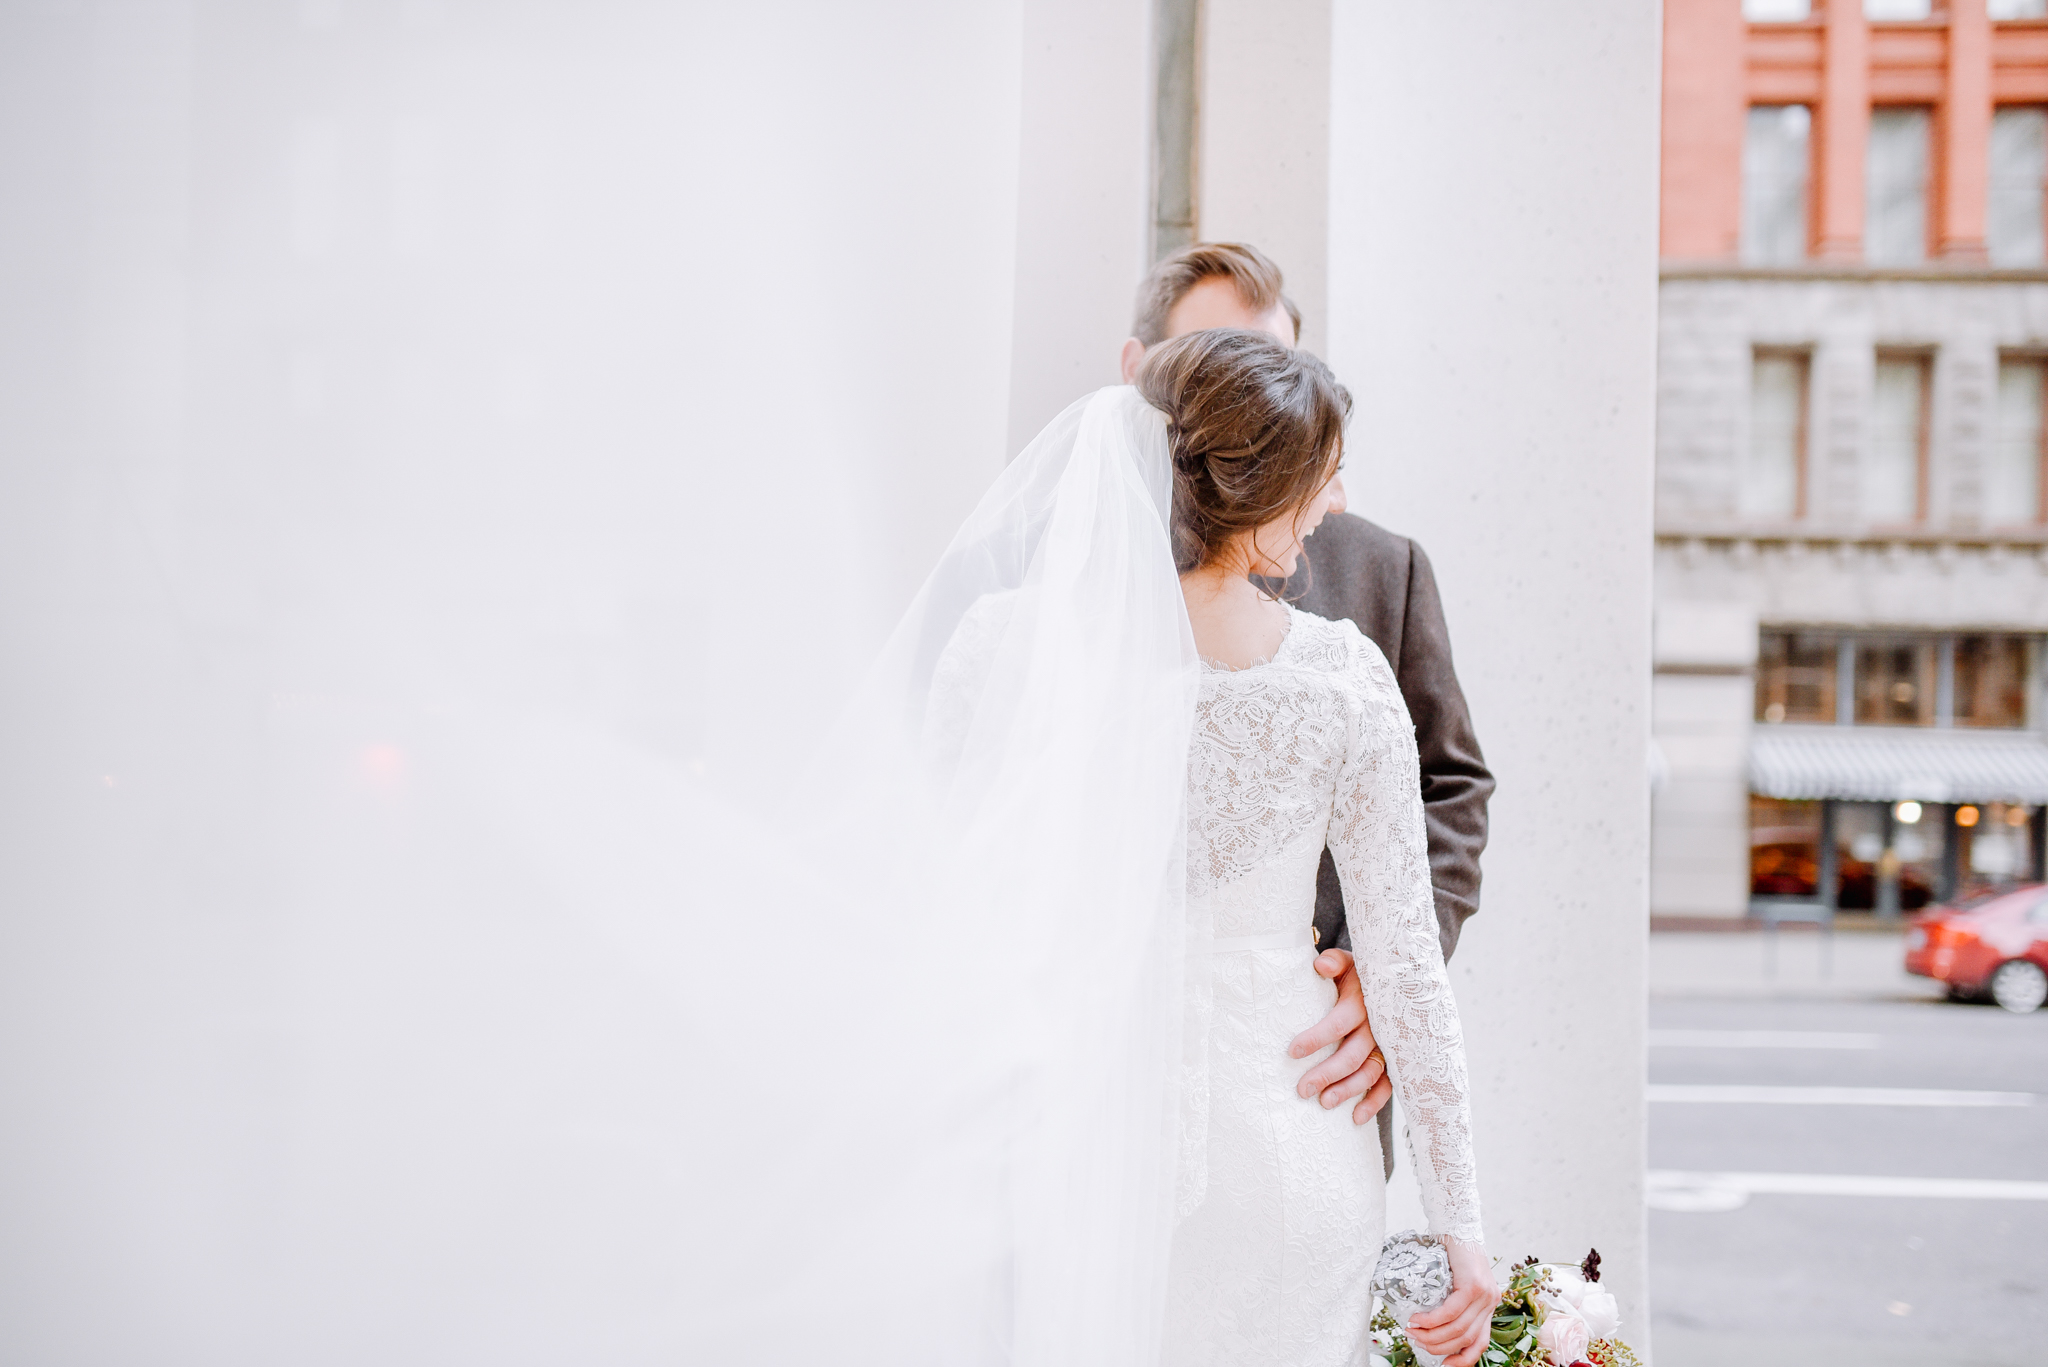 Manu and Laura - Portland Wedding Photographer - 82.jpg